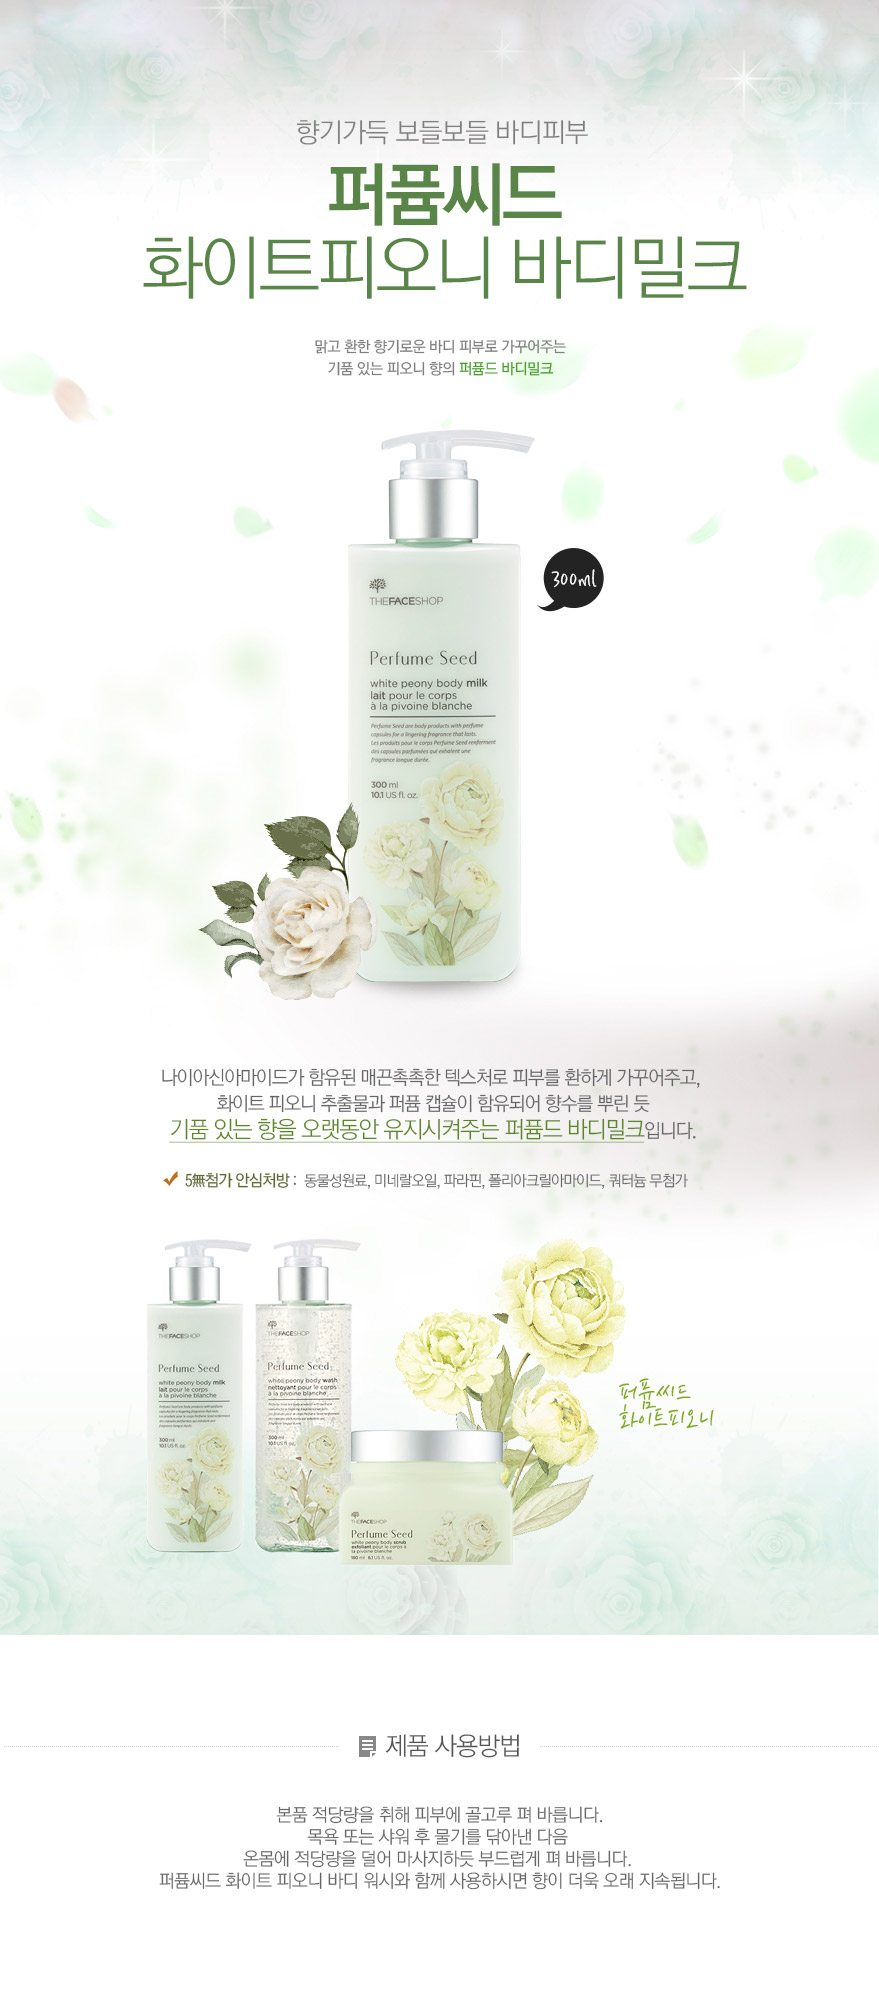 The Face Shop Perfume Seed White Peony Body Milk 300ml malaysia singapore indonesia